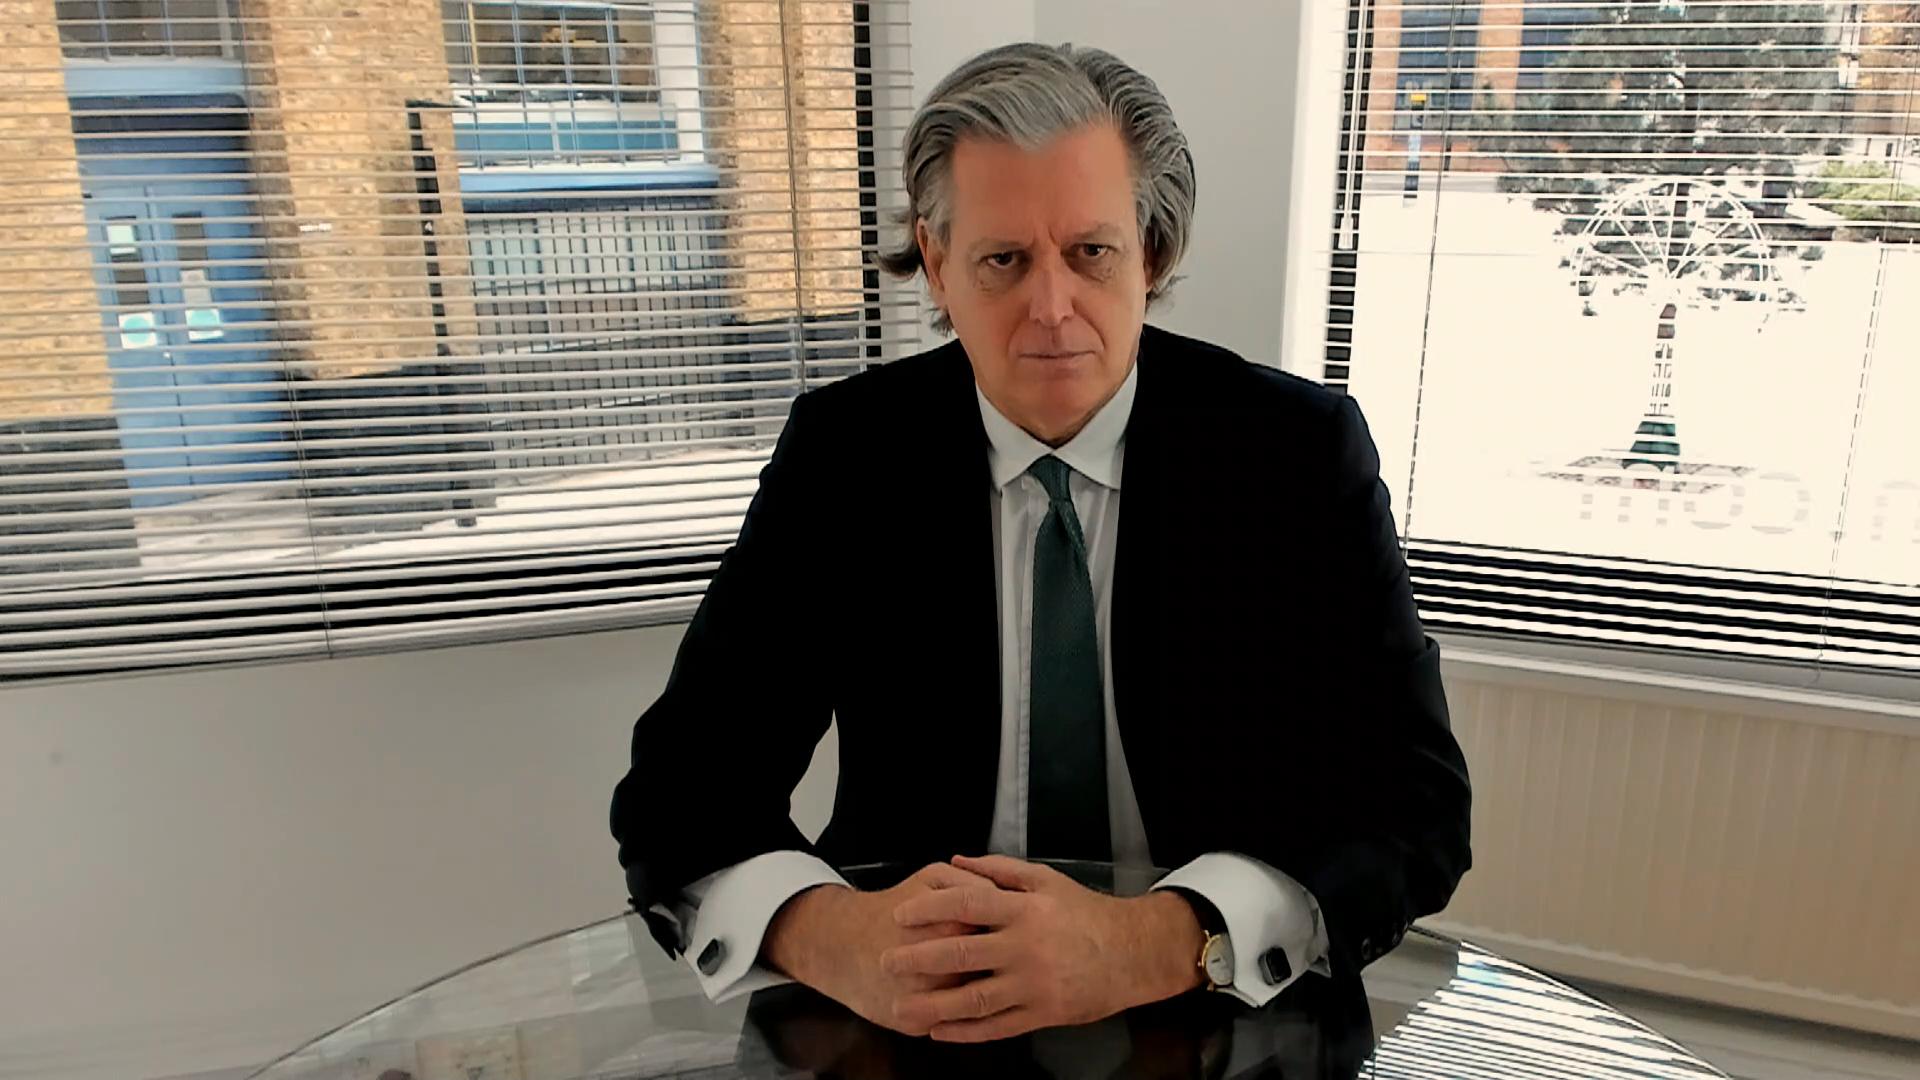 R (Bussetti) v Director of Public Prosecutions [2020] EWHC 3004 (Admin)